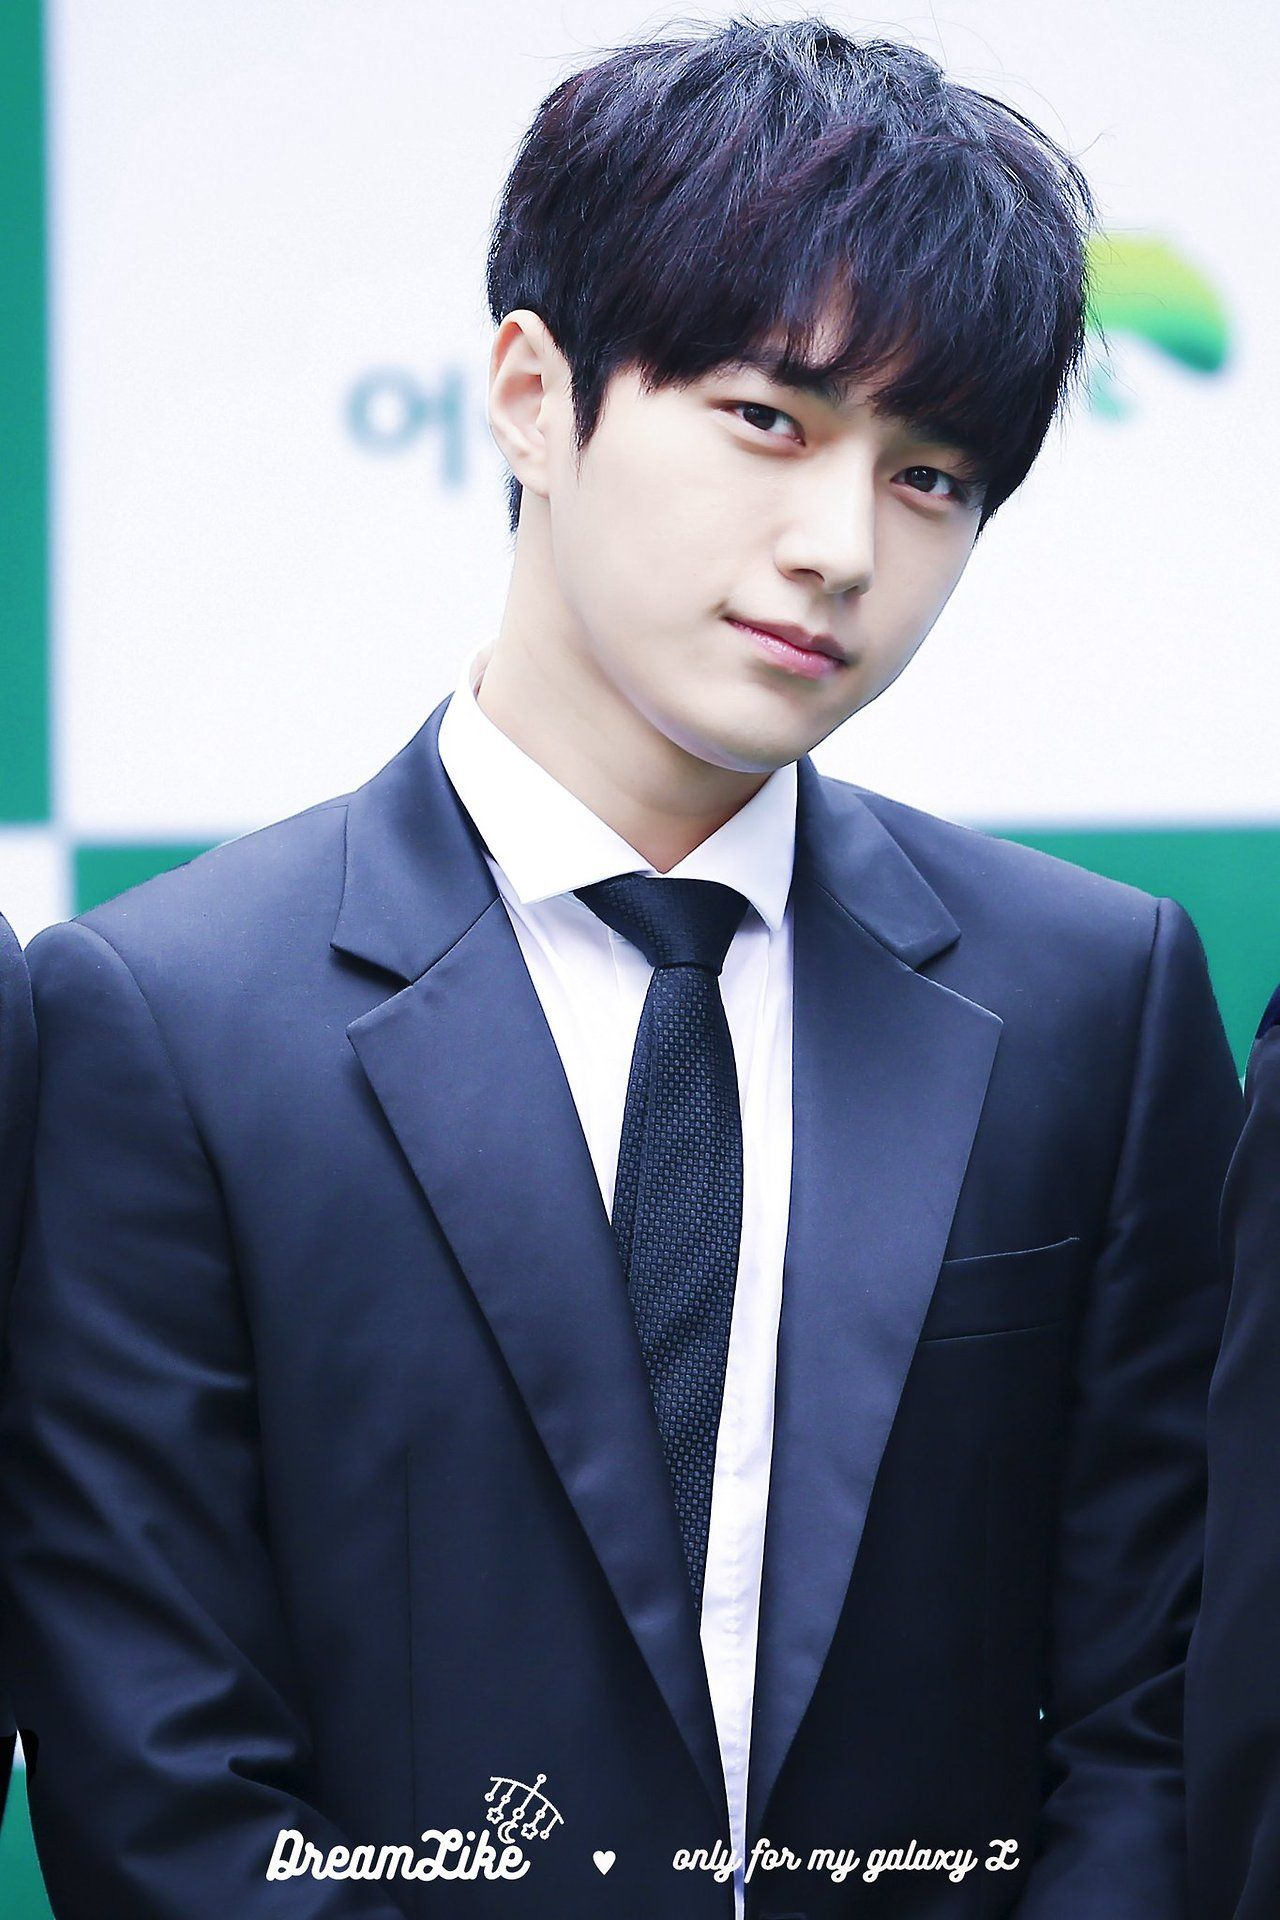 170425 Green Umbrella Child Fund Ambassador Ceremony C Dreamlike Do Not Crop Or Edit Myungsoo Kim Myung Soo Korean Celebrities